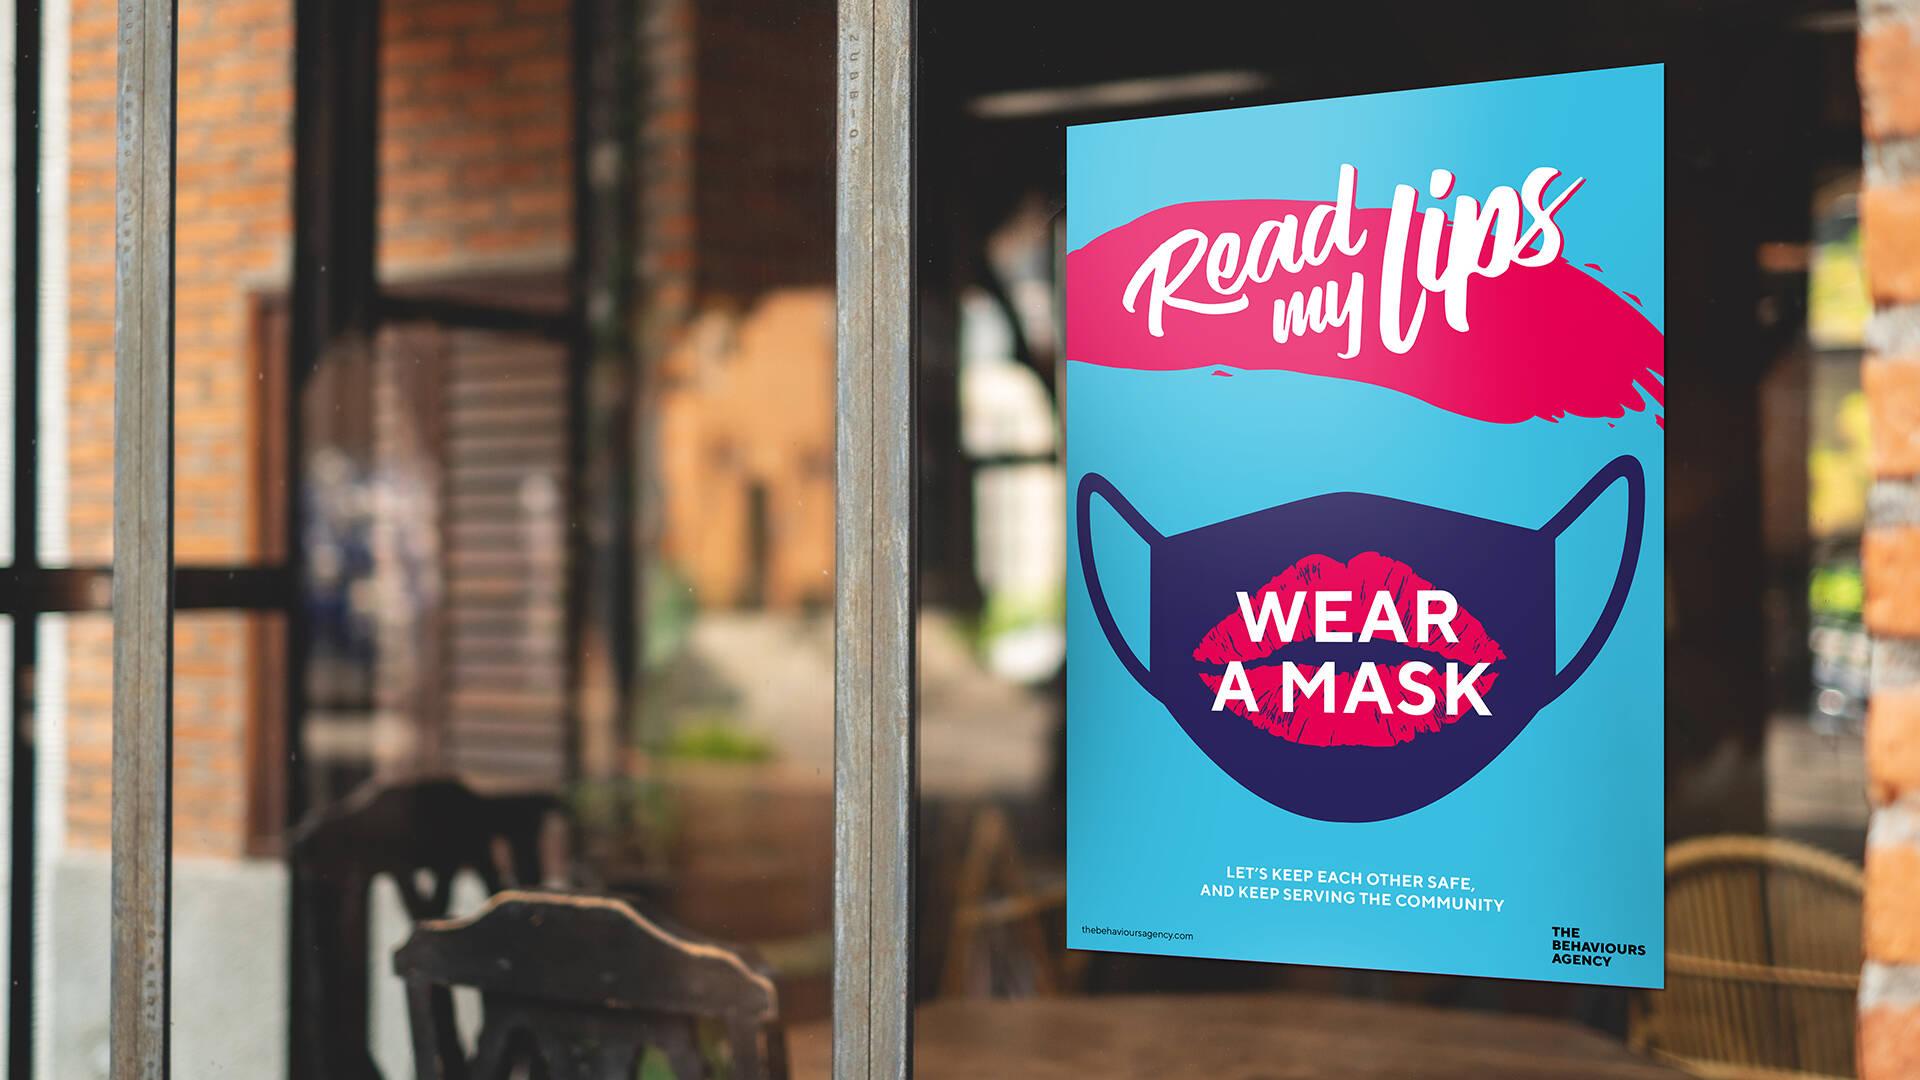 Behavioural-led mask posters